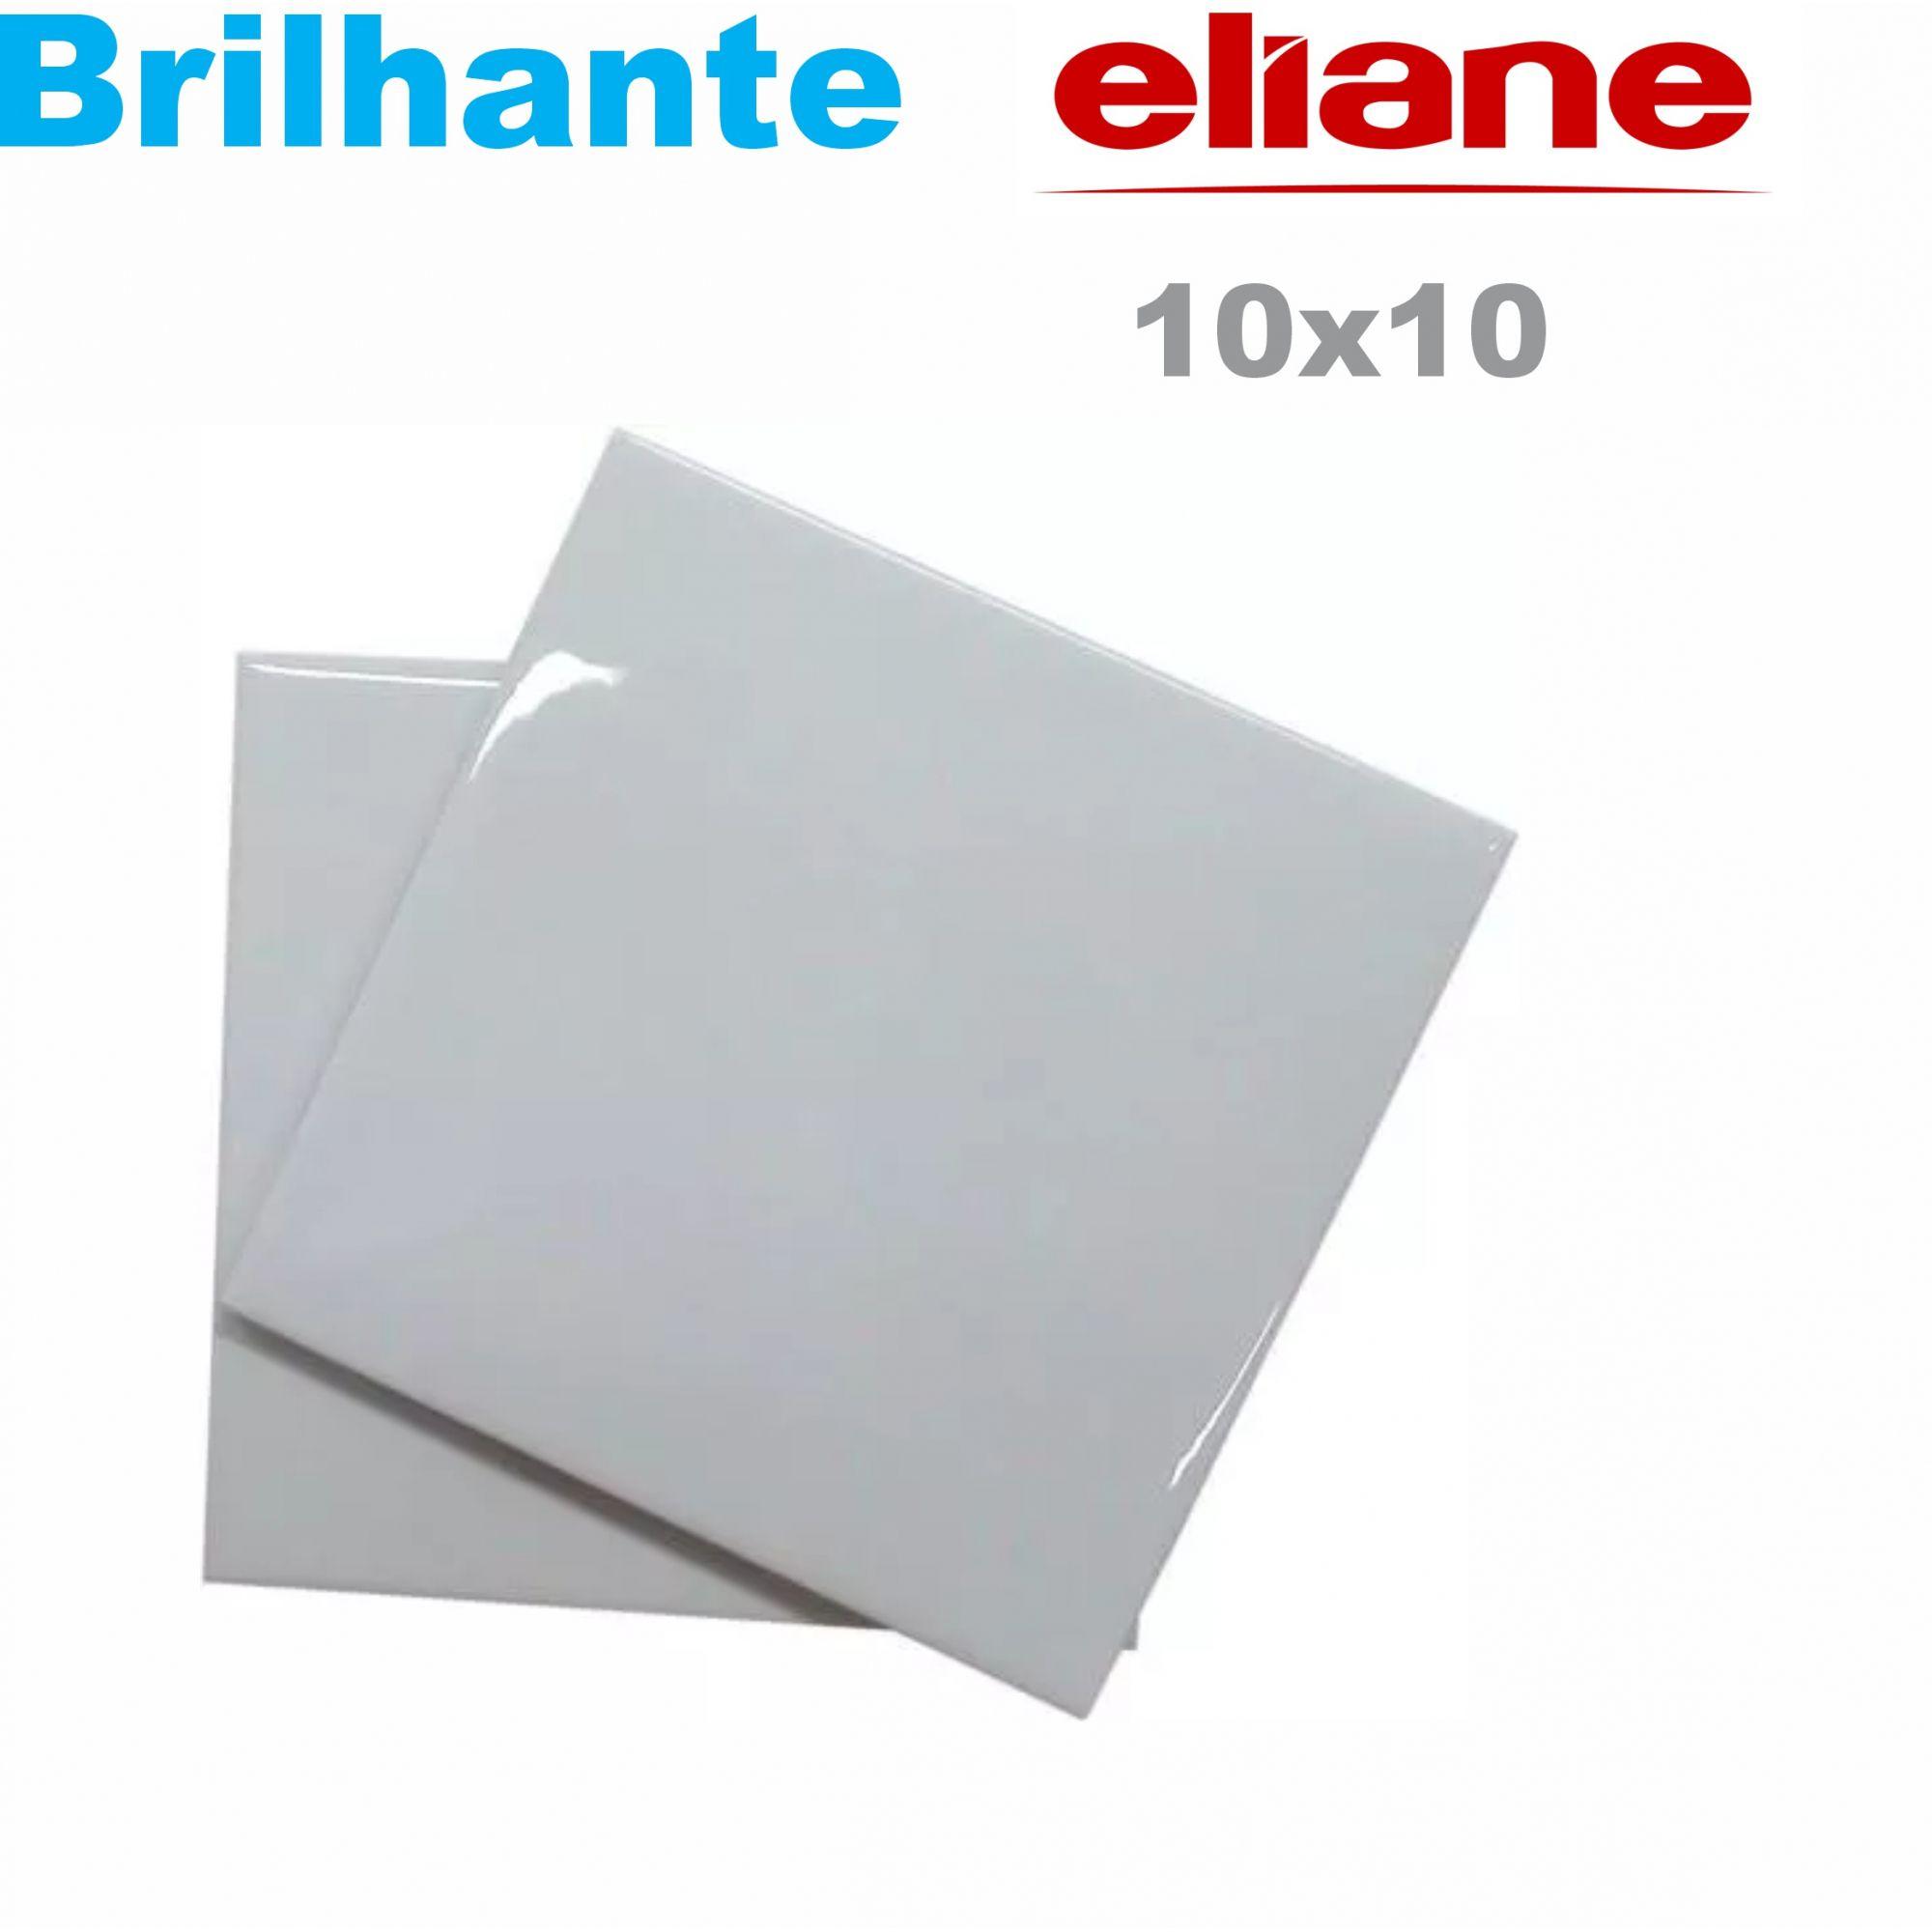 Azulejo Brilhante 10x10